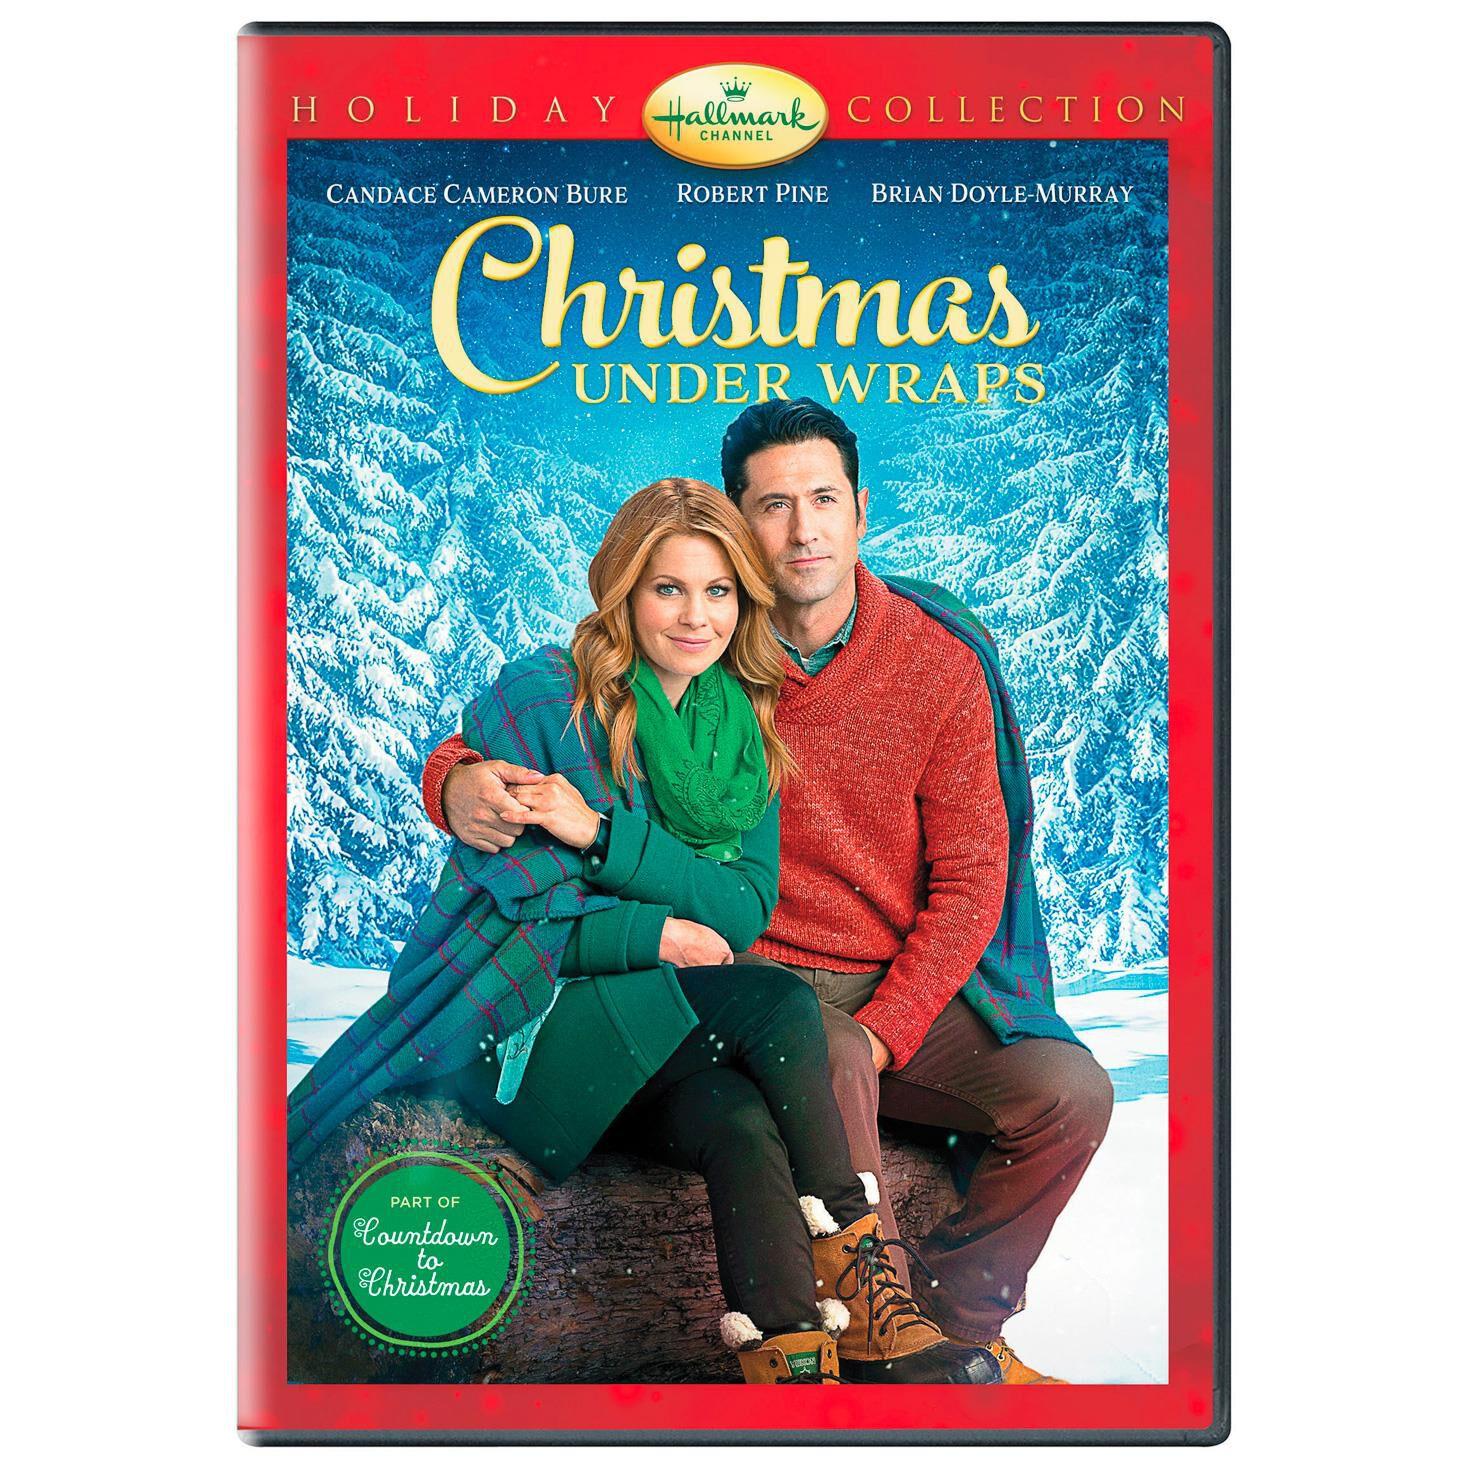 Christmas Under Wraps DVD - Hallmark